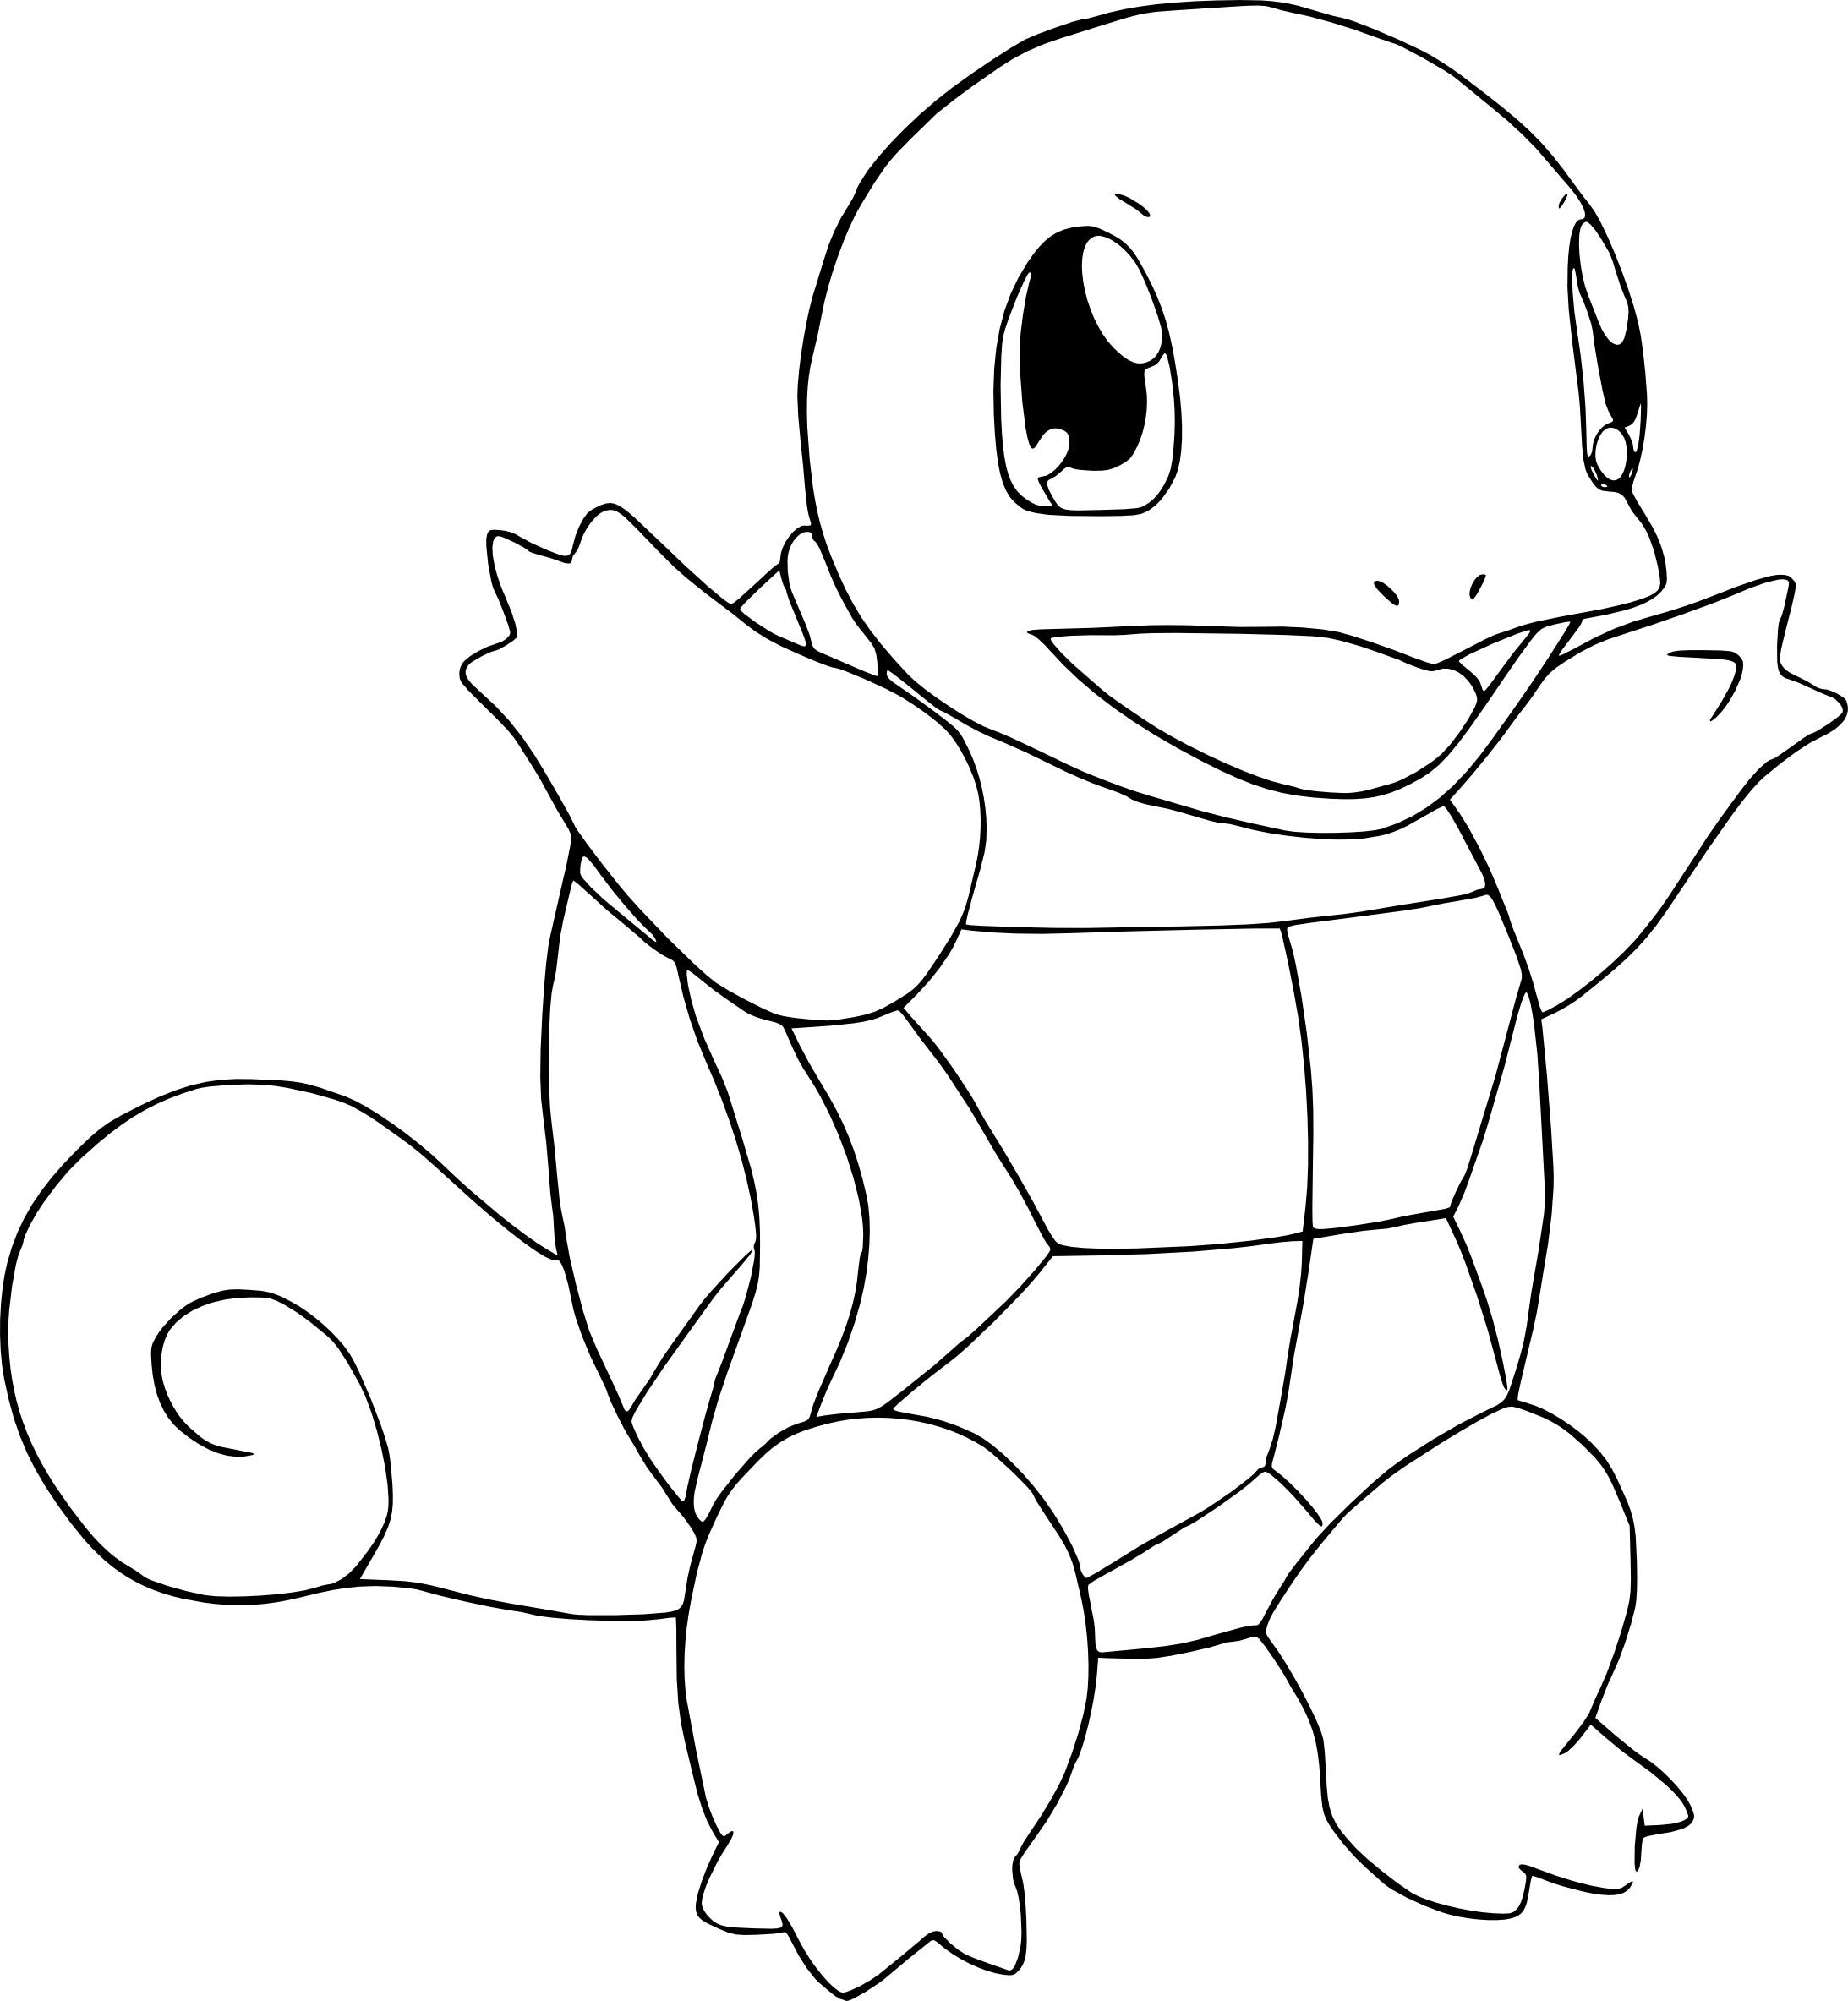 Coloriage Carapuce Pokemon A Imprimer